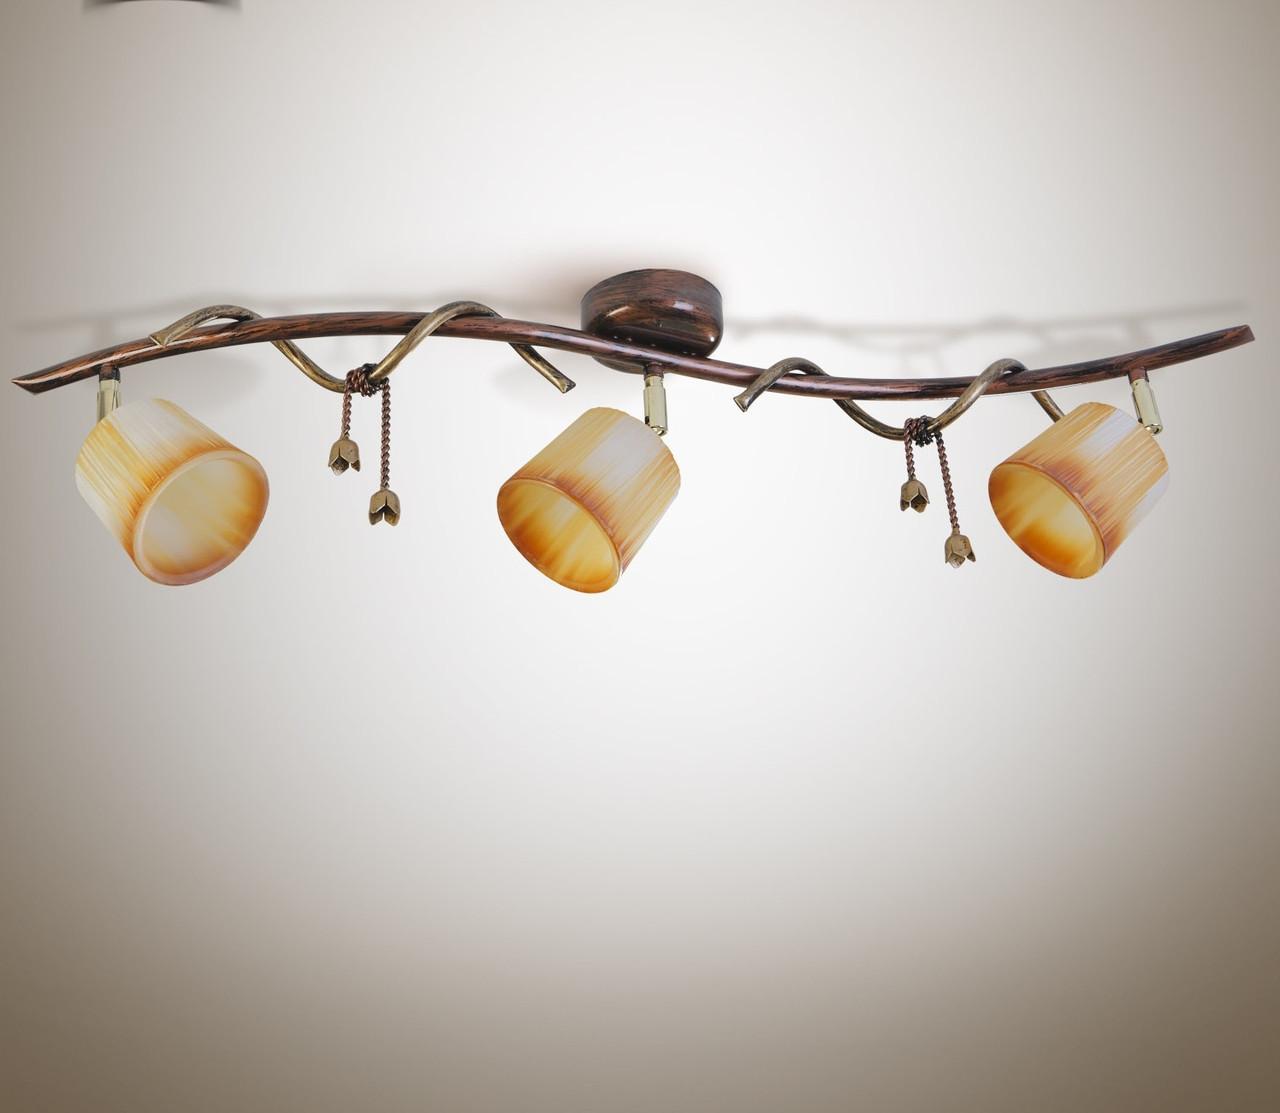 Люстра 3-х ламповая, металлическая, спальня, кухня, прихожая 9803-1